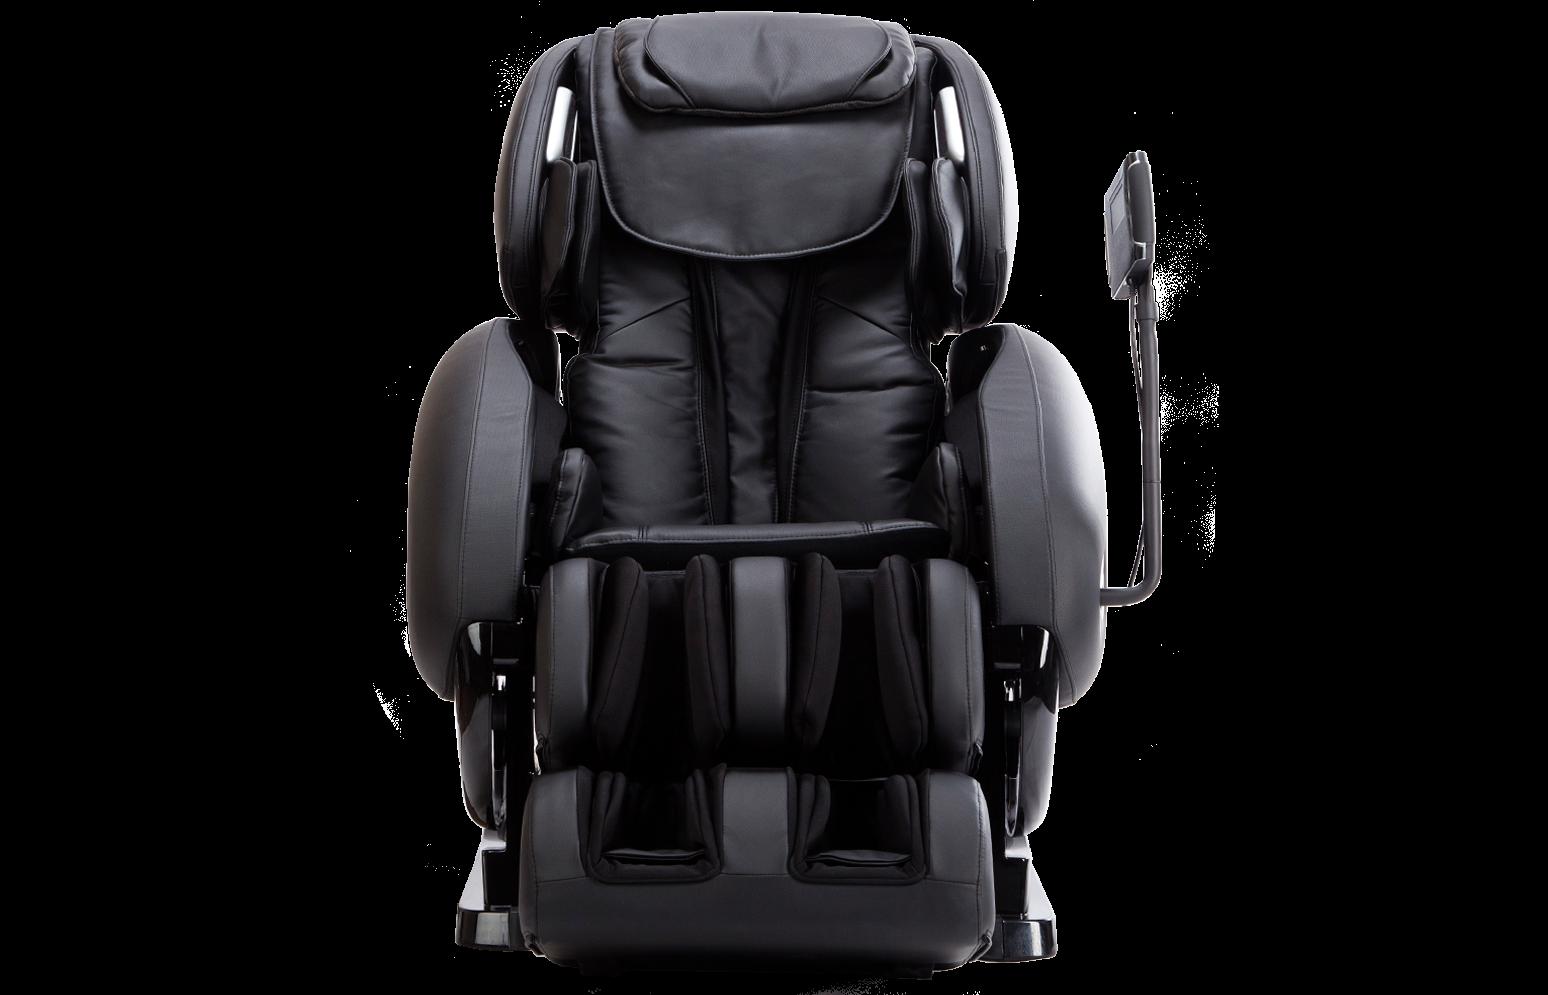 Relax 2 zero 2.0 Massage Chair